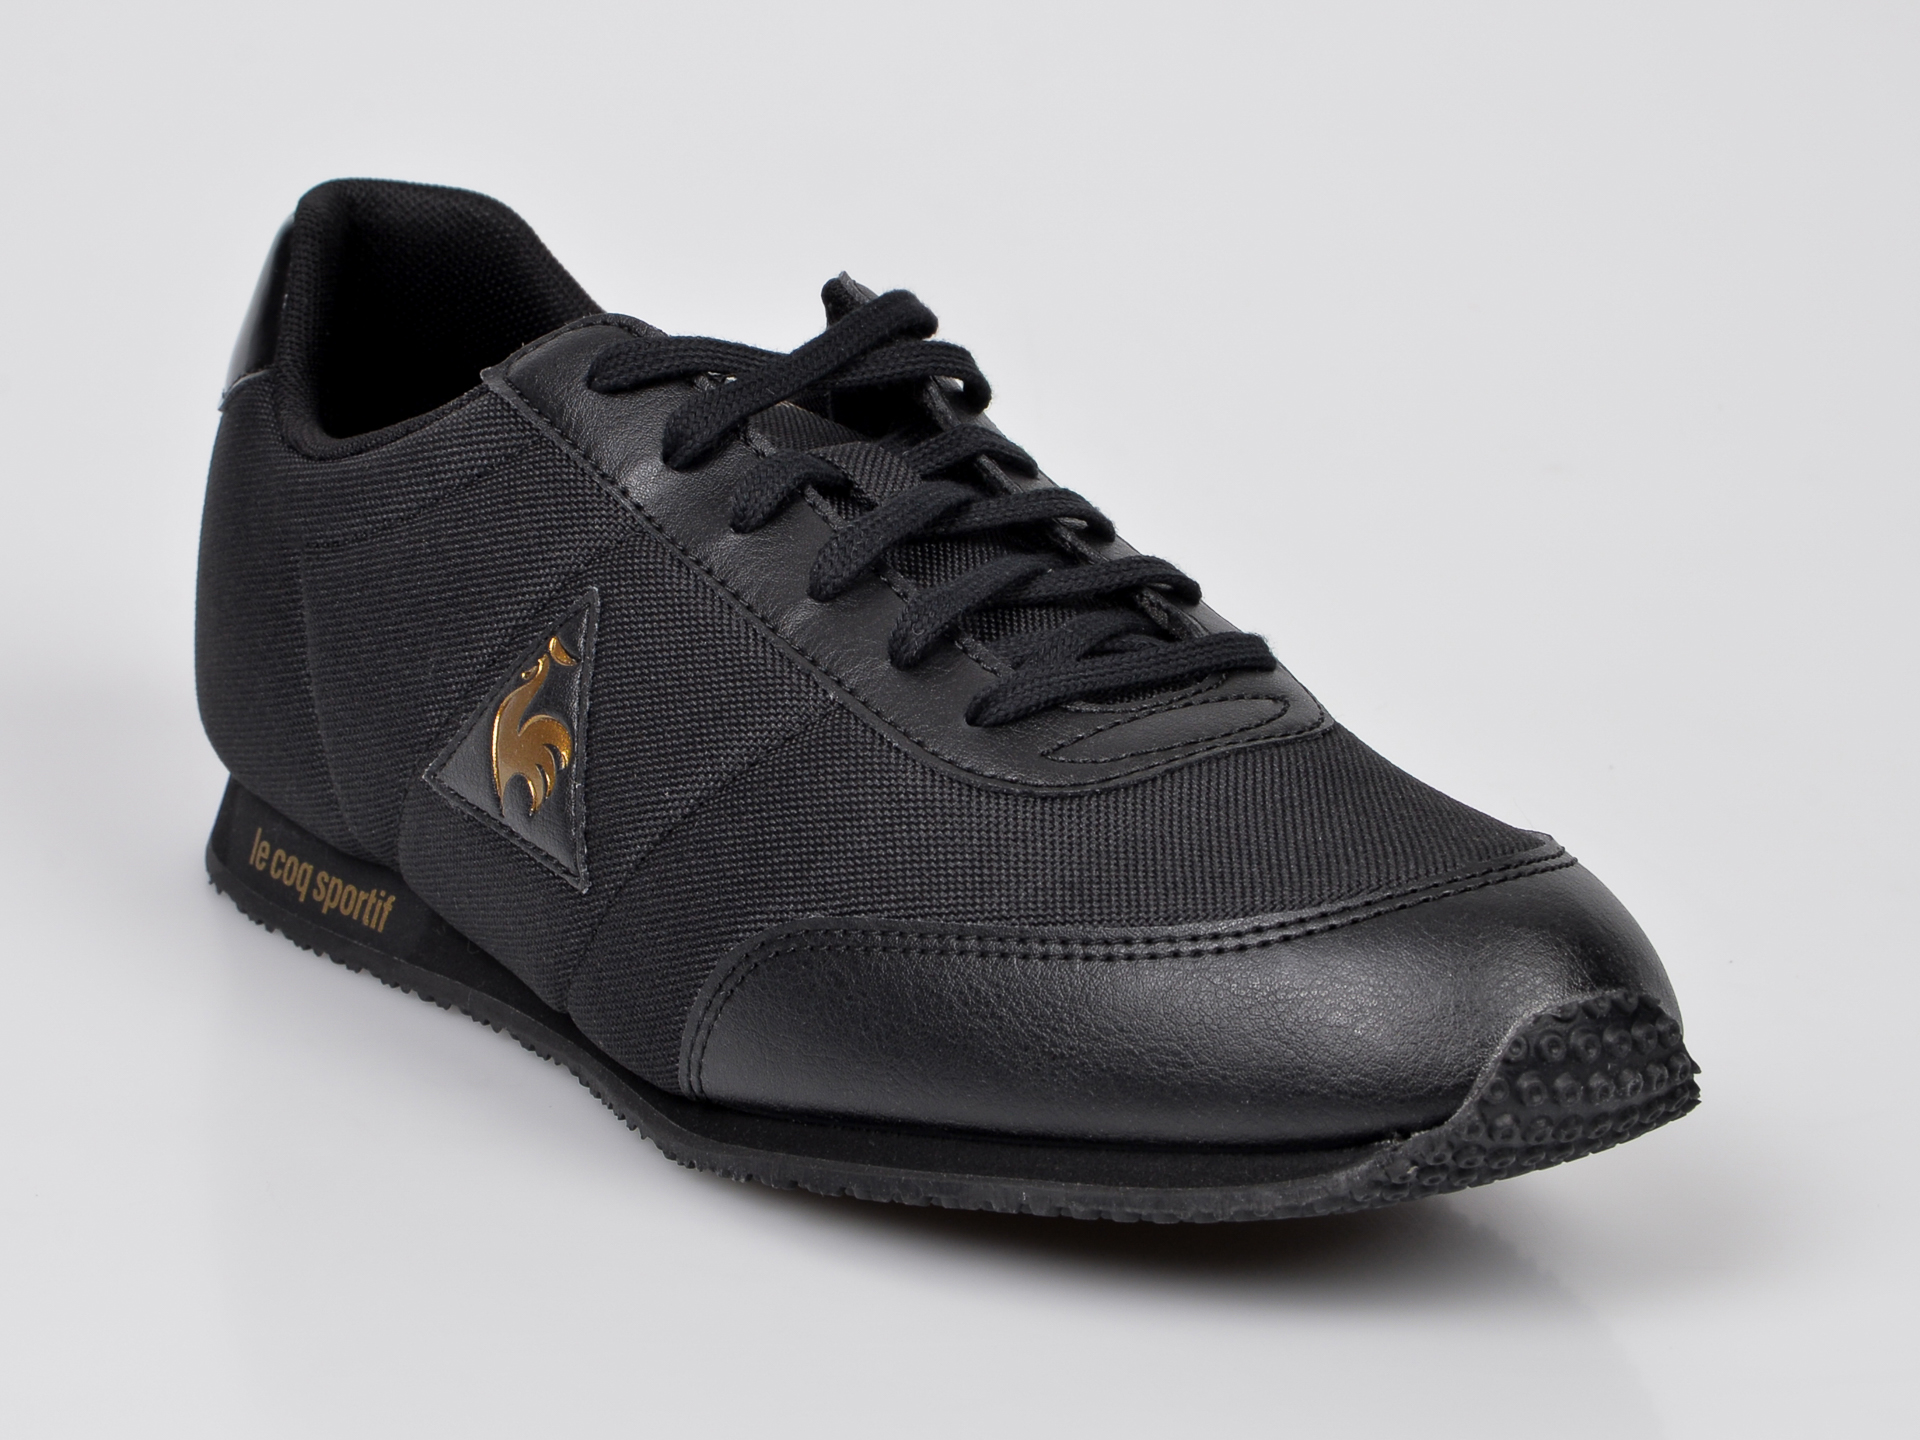 Pantofi Sport Le Coq Sportif Negri, 1720264, Din Material Textil